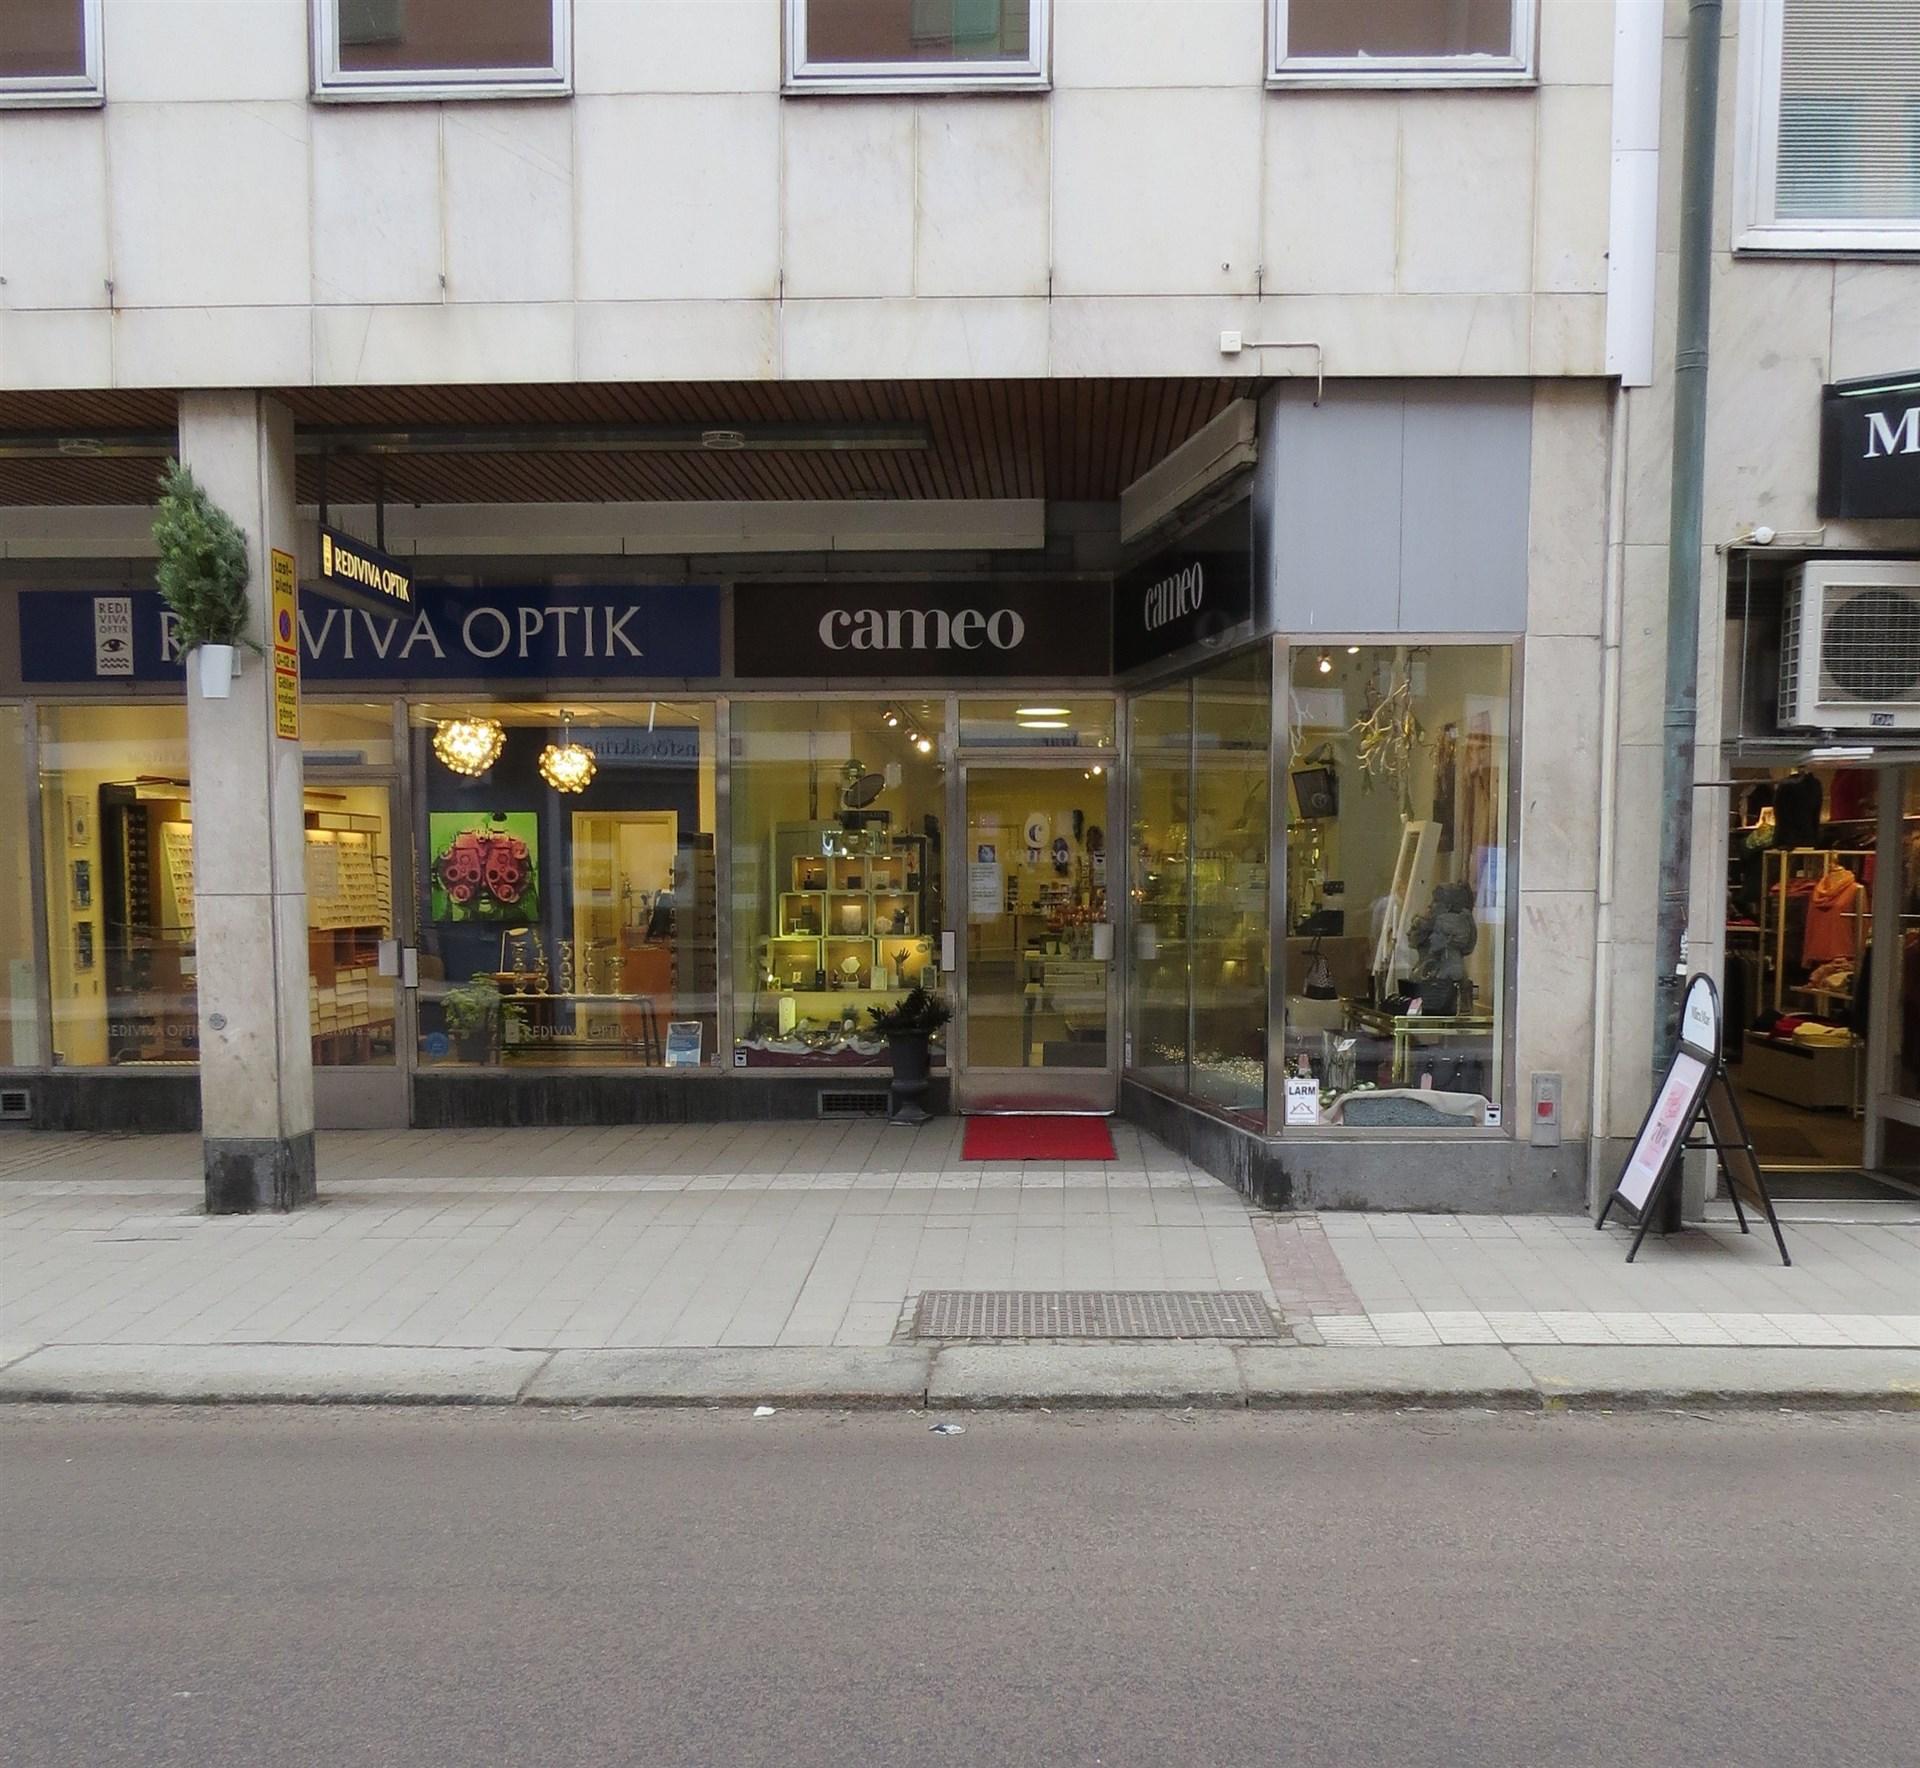 Drottninggatan 4